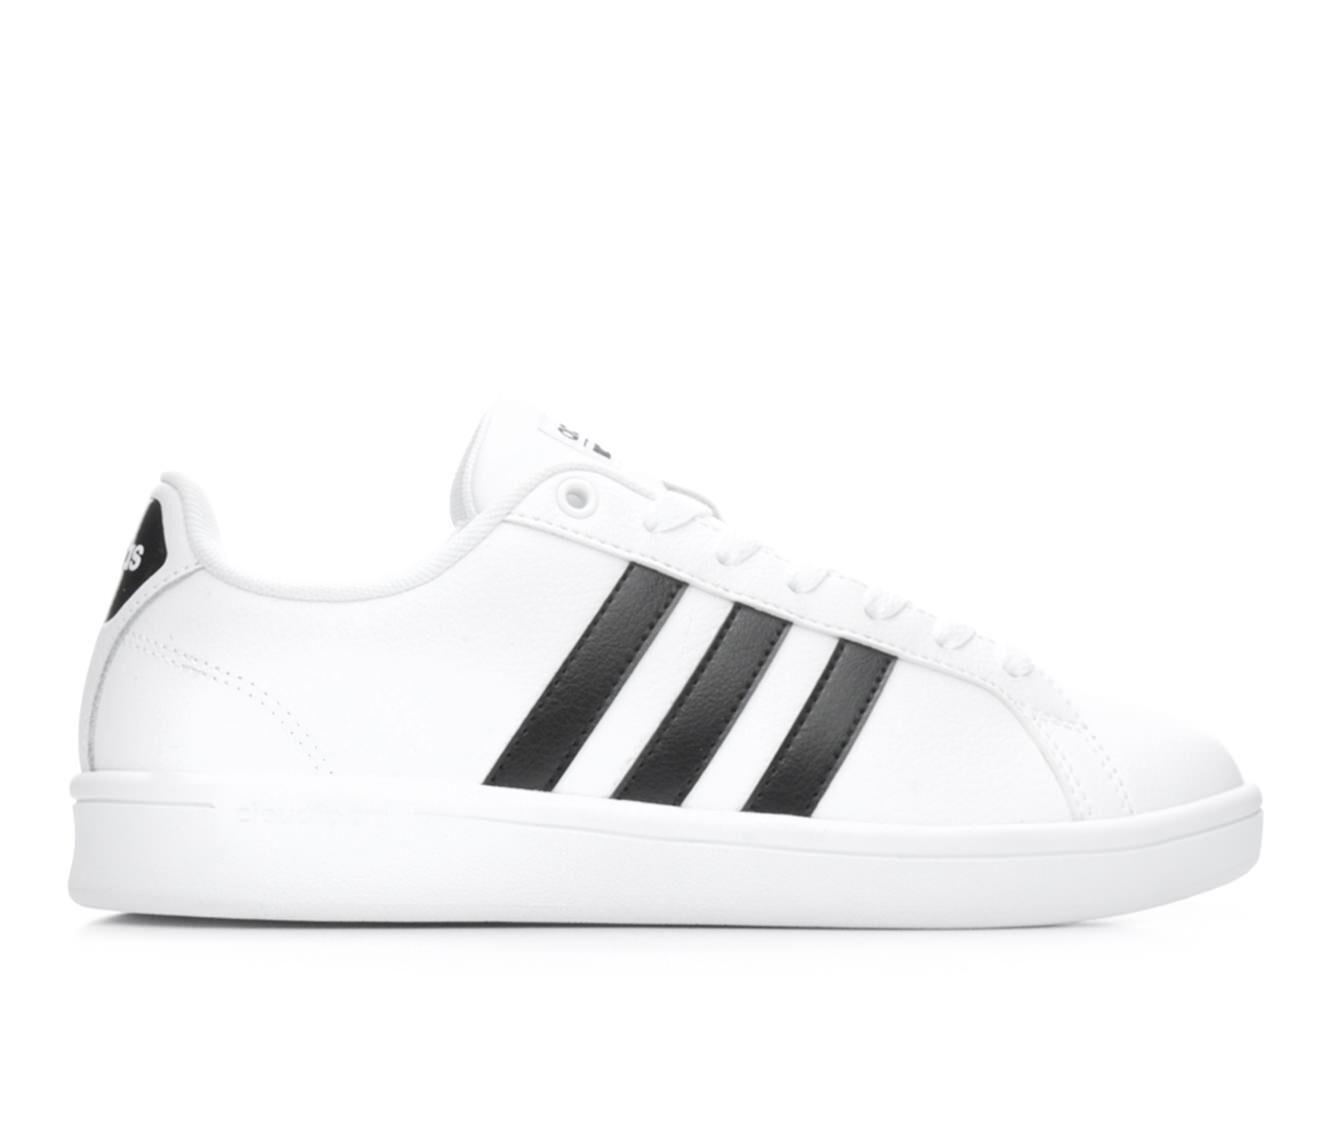 Women's Adidas Advantage Stripes Sneakers White/Black